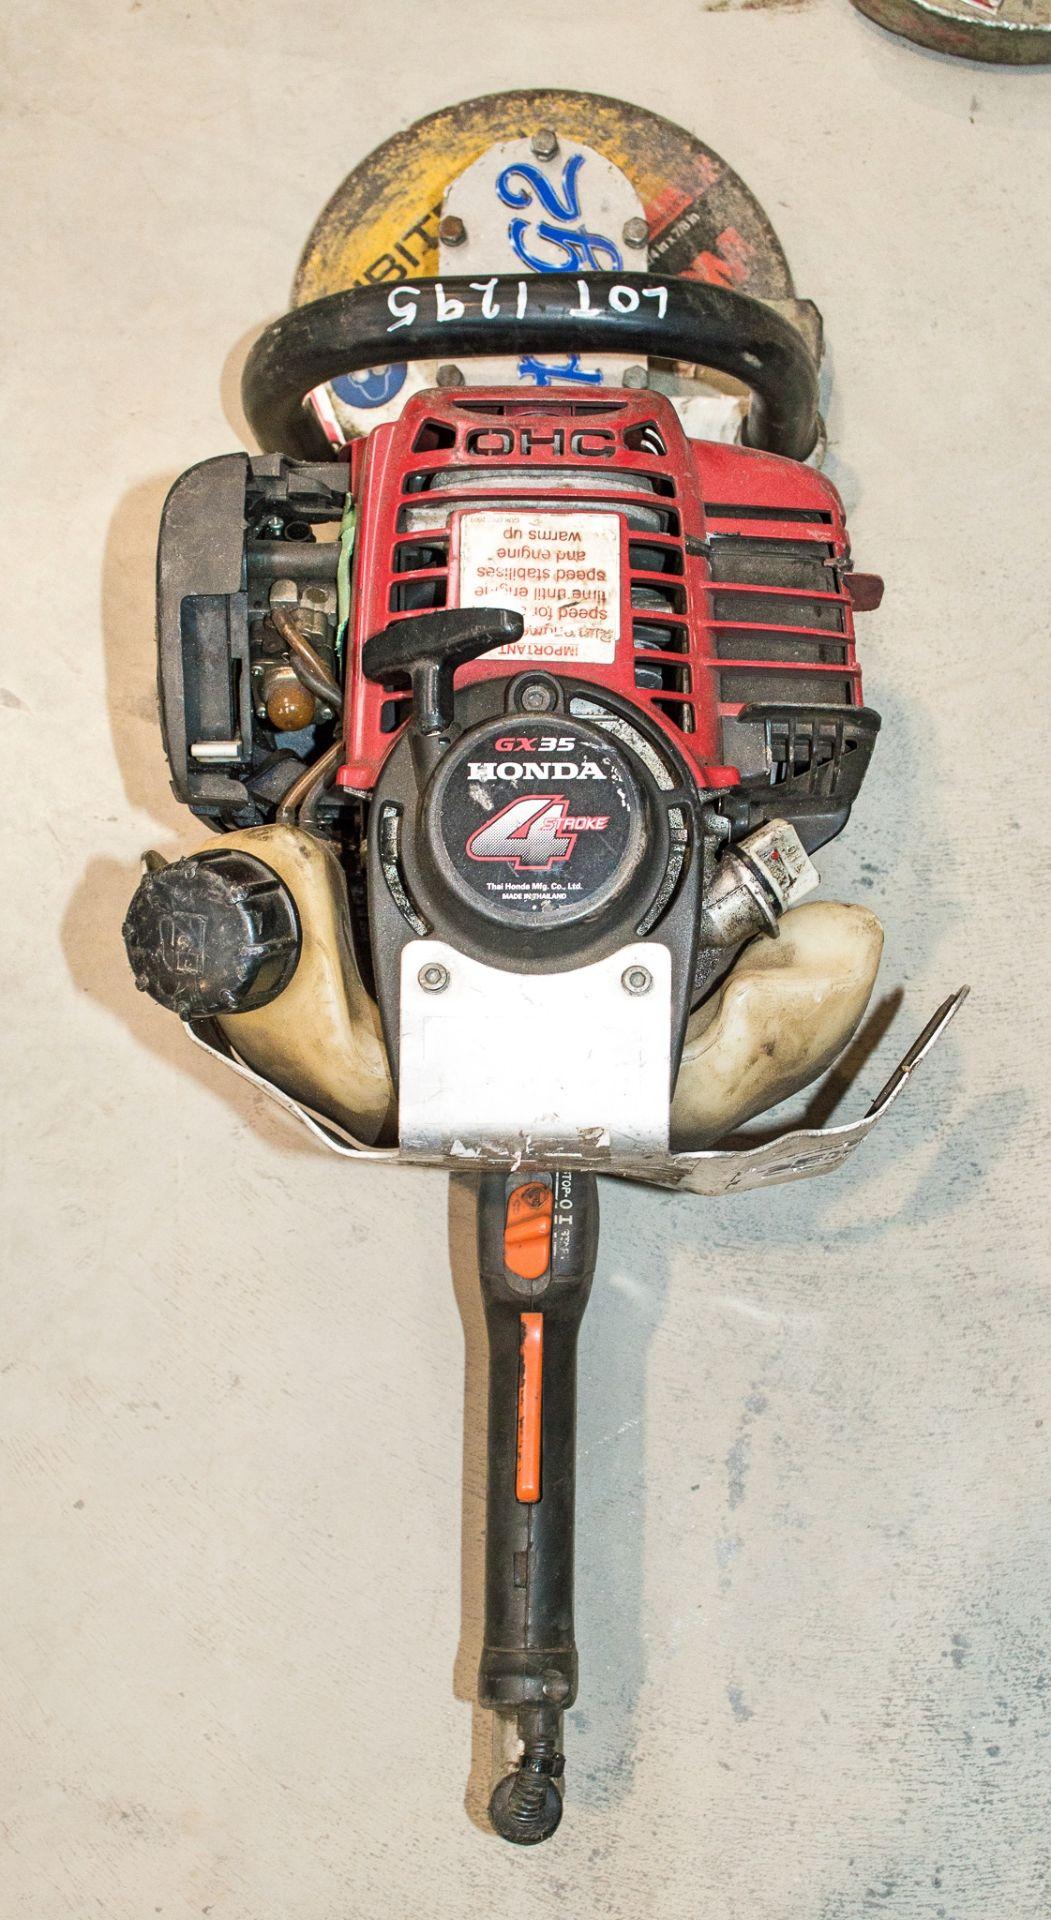 Geismar PHG2 petrol driven 4 stroke cut off saw - Image 2 of 2